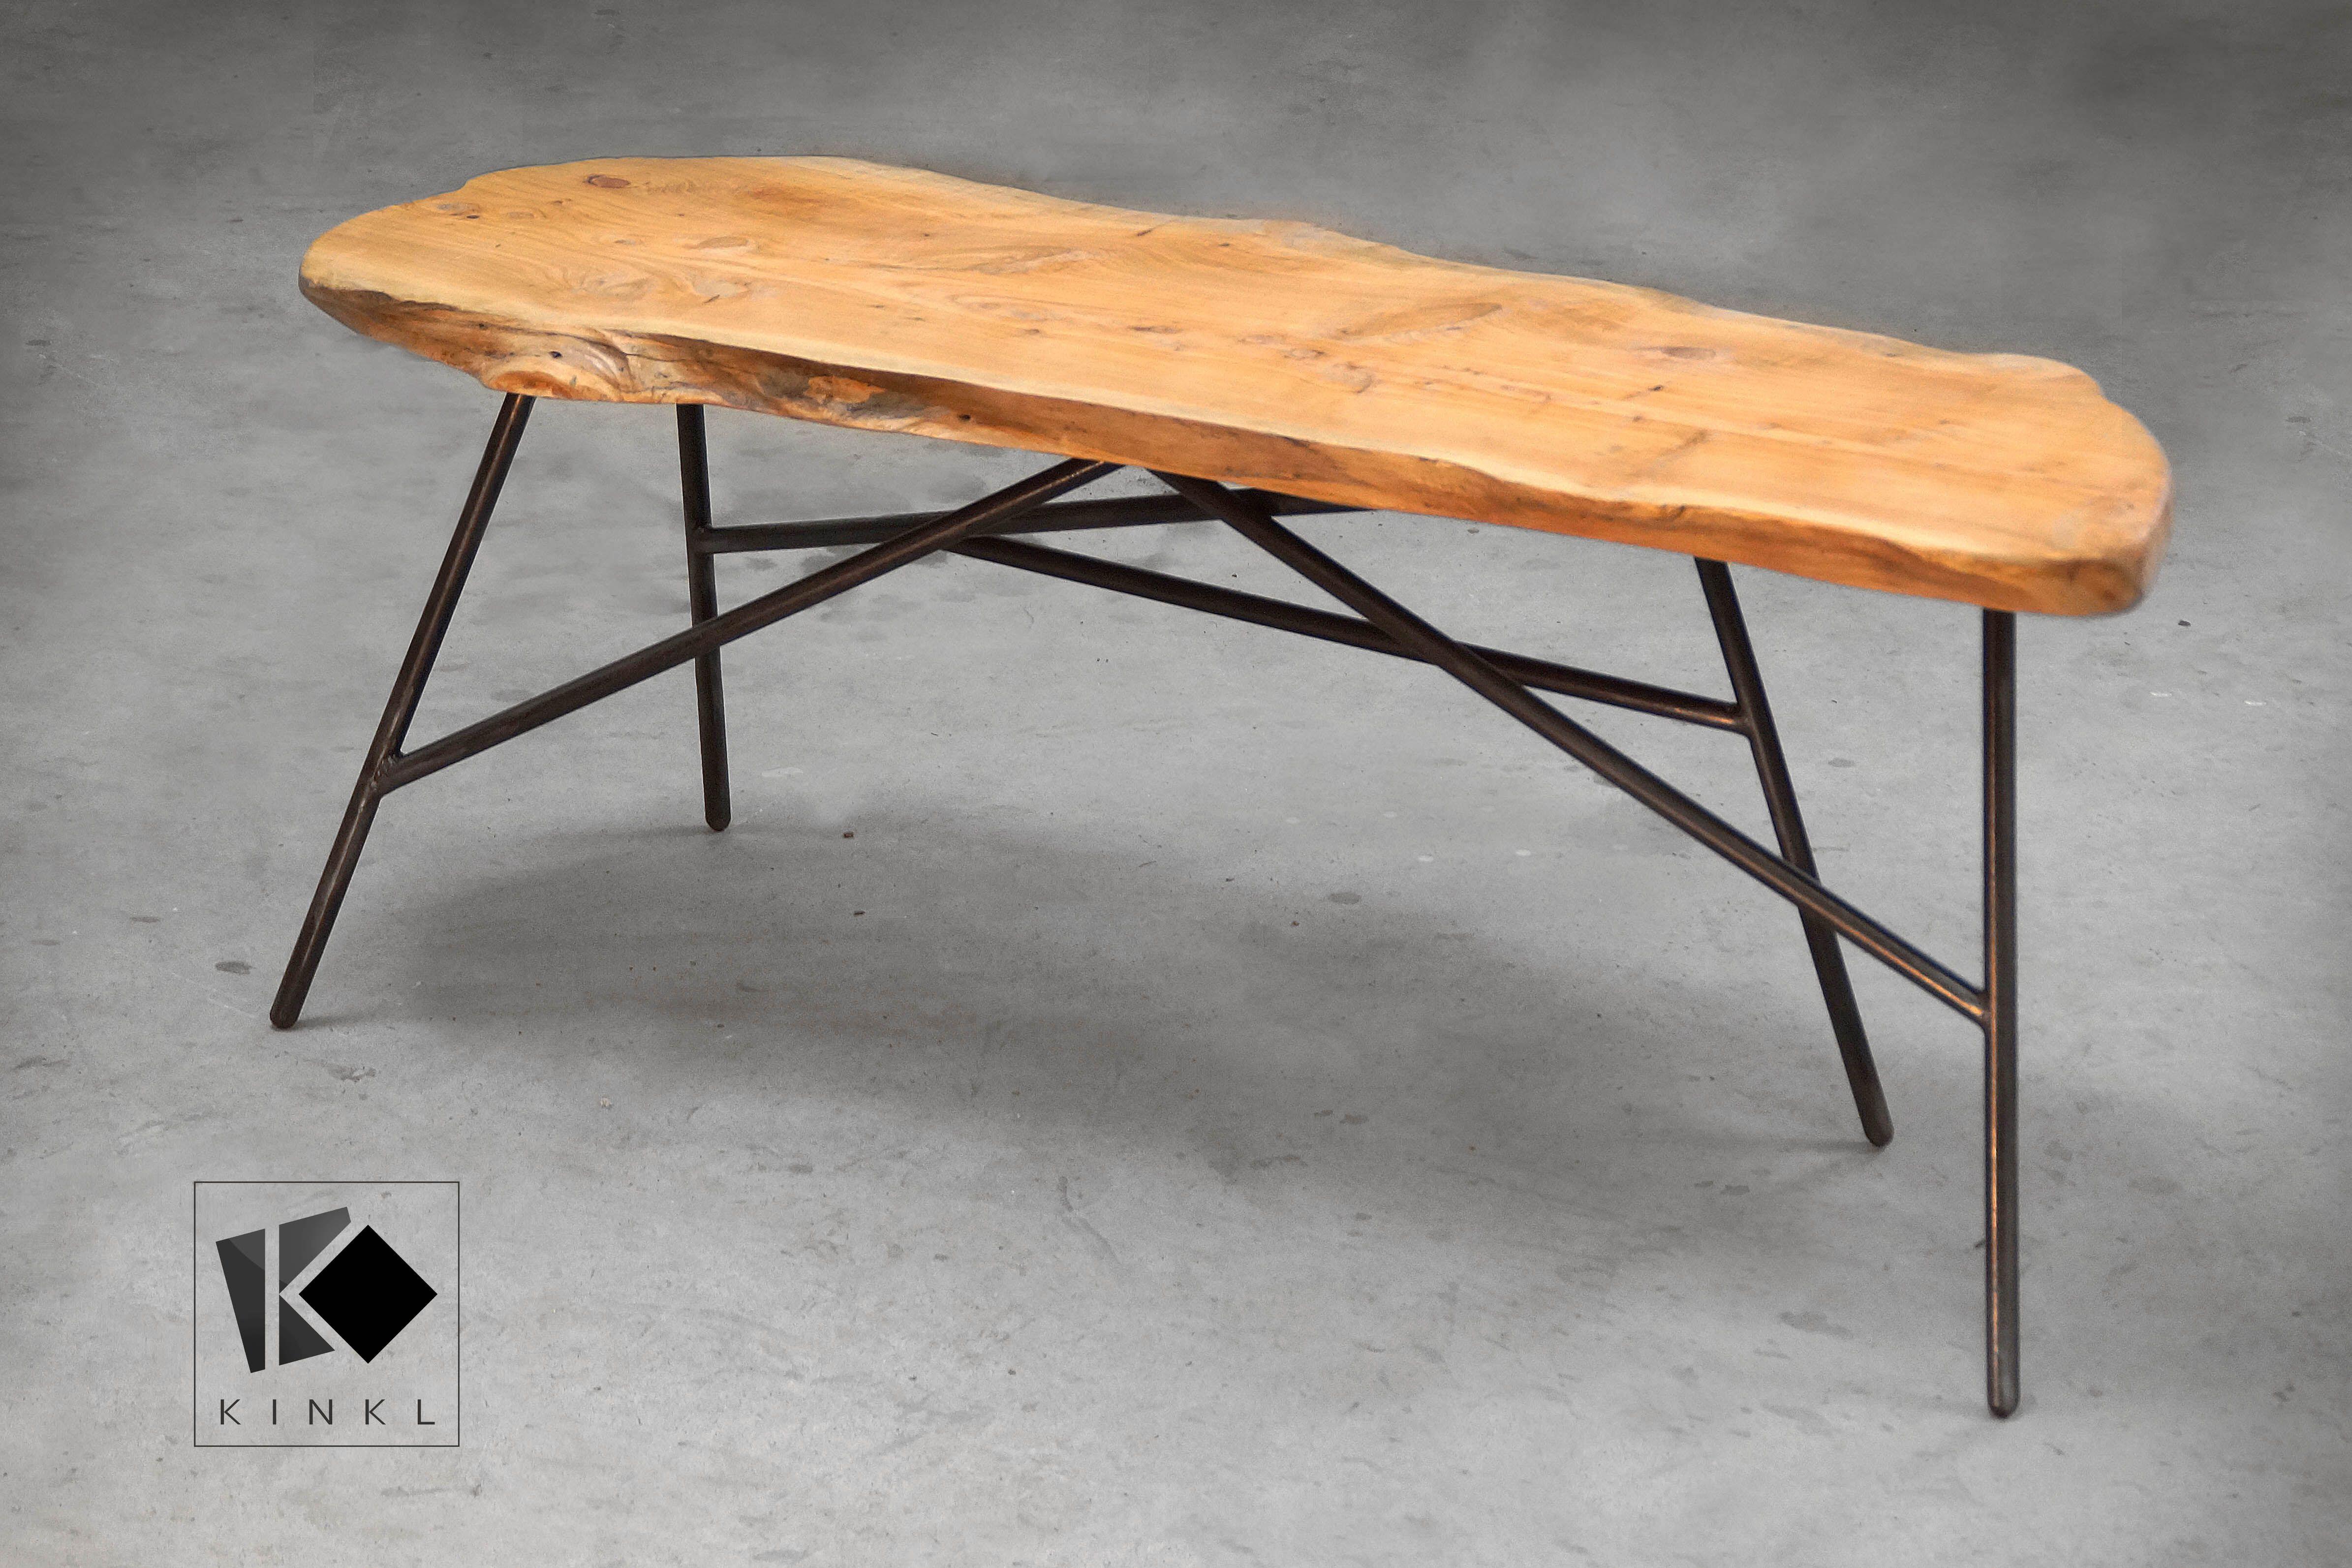 Table Basse Banc Bois